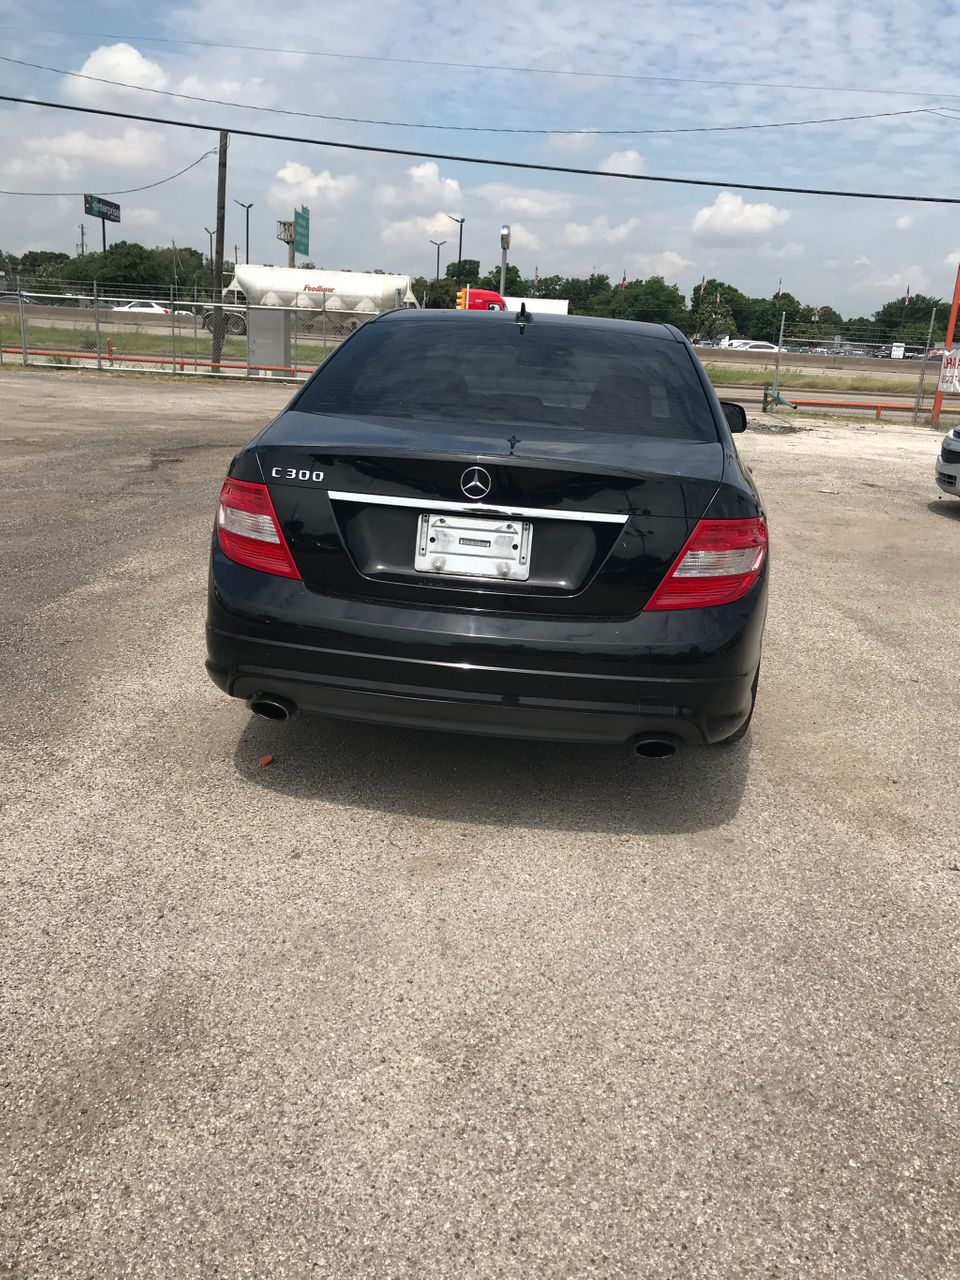 2009 Mercedes-Benz C-Class | Houston, TX, Black (Black)